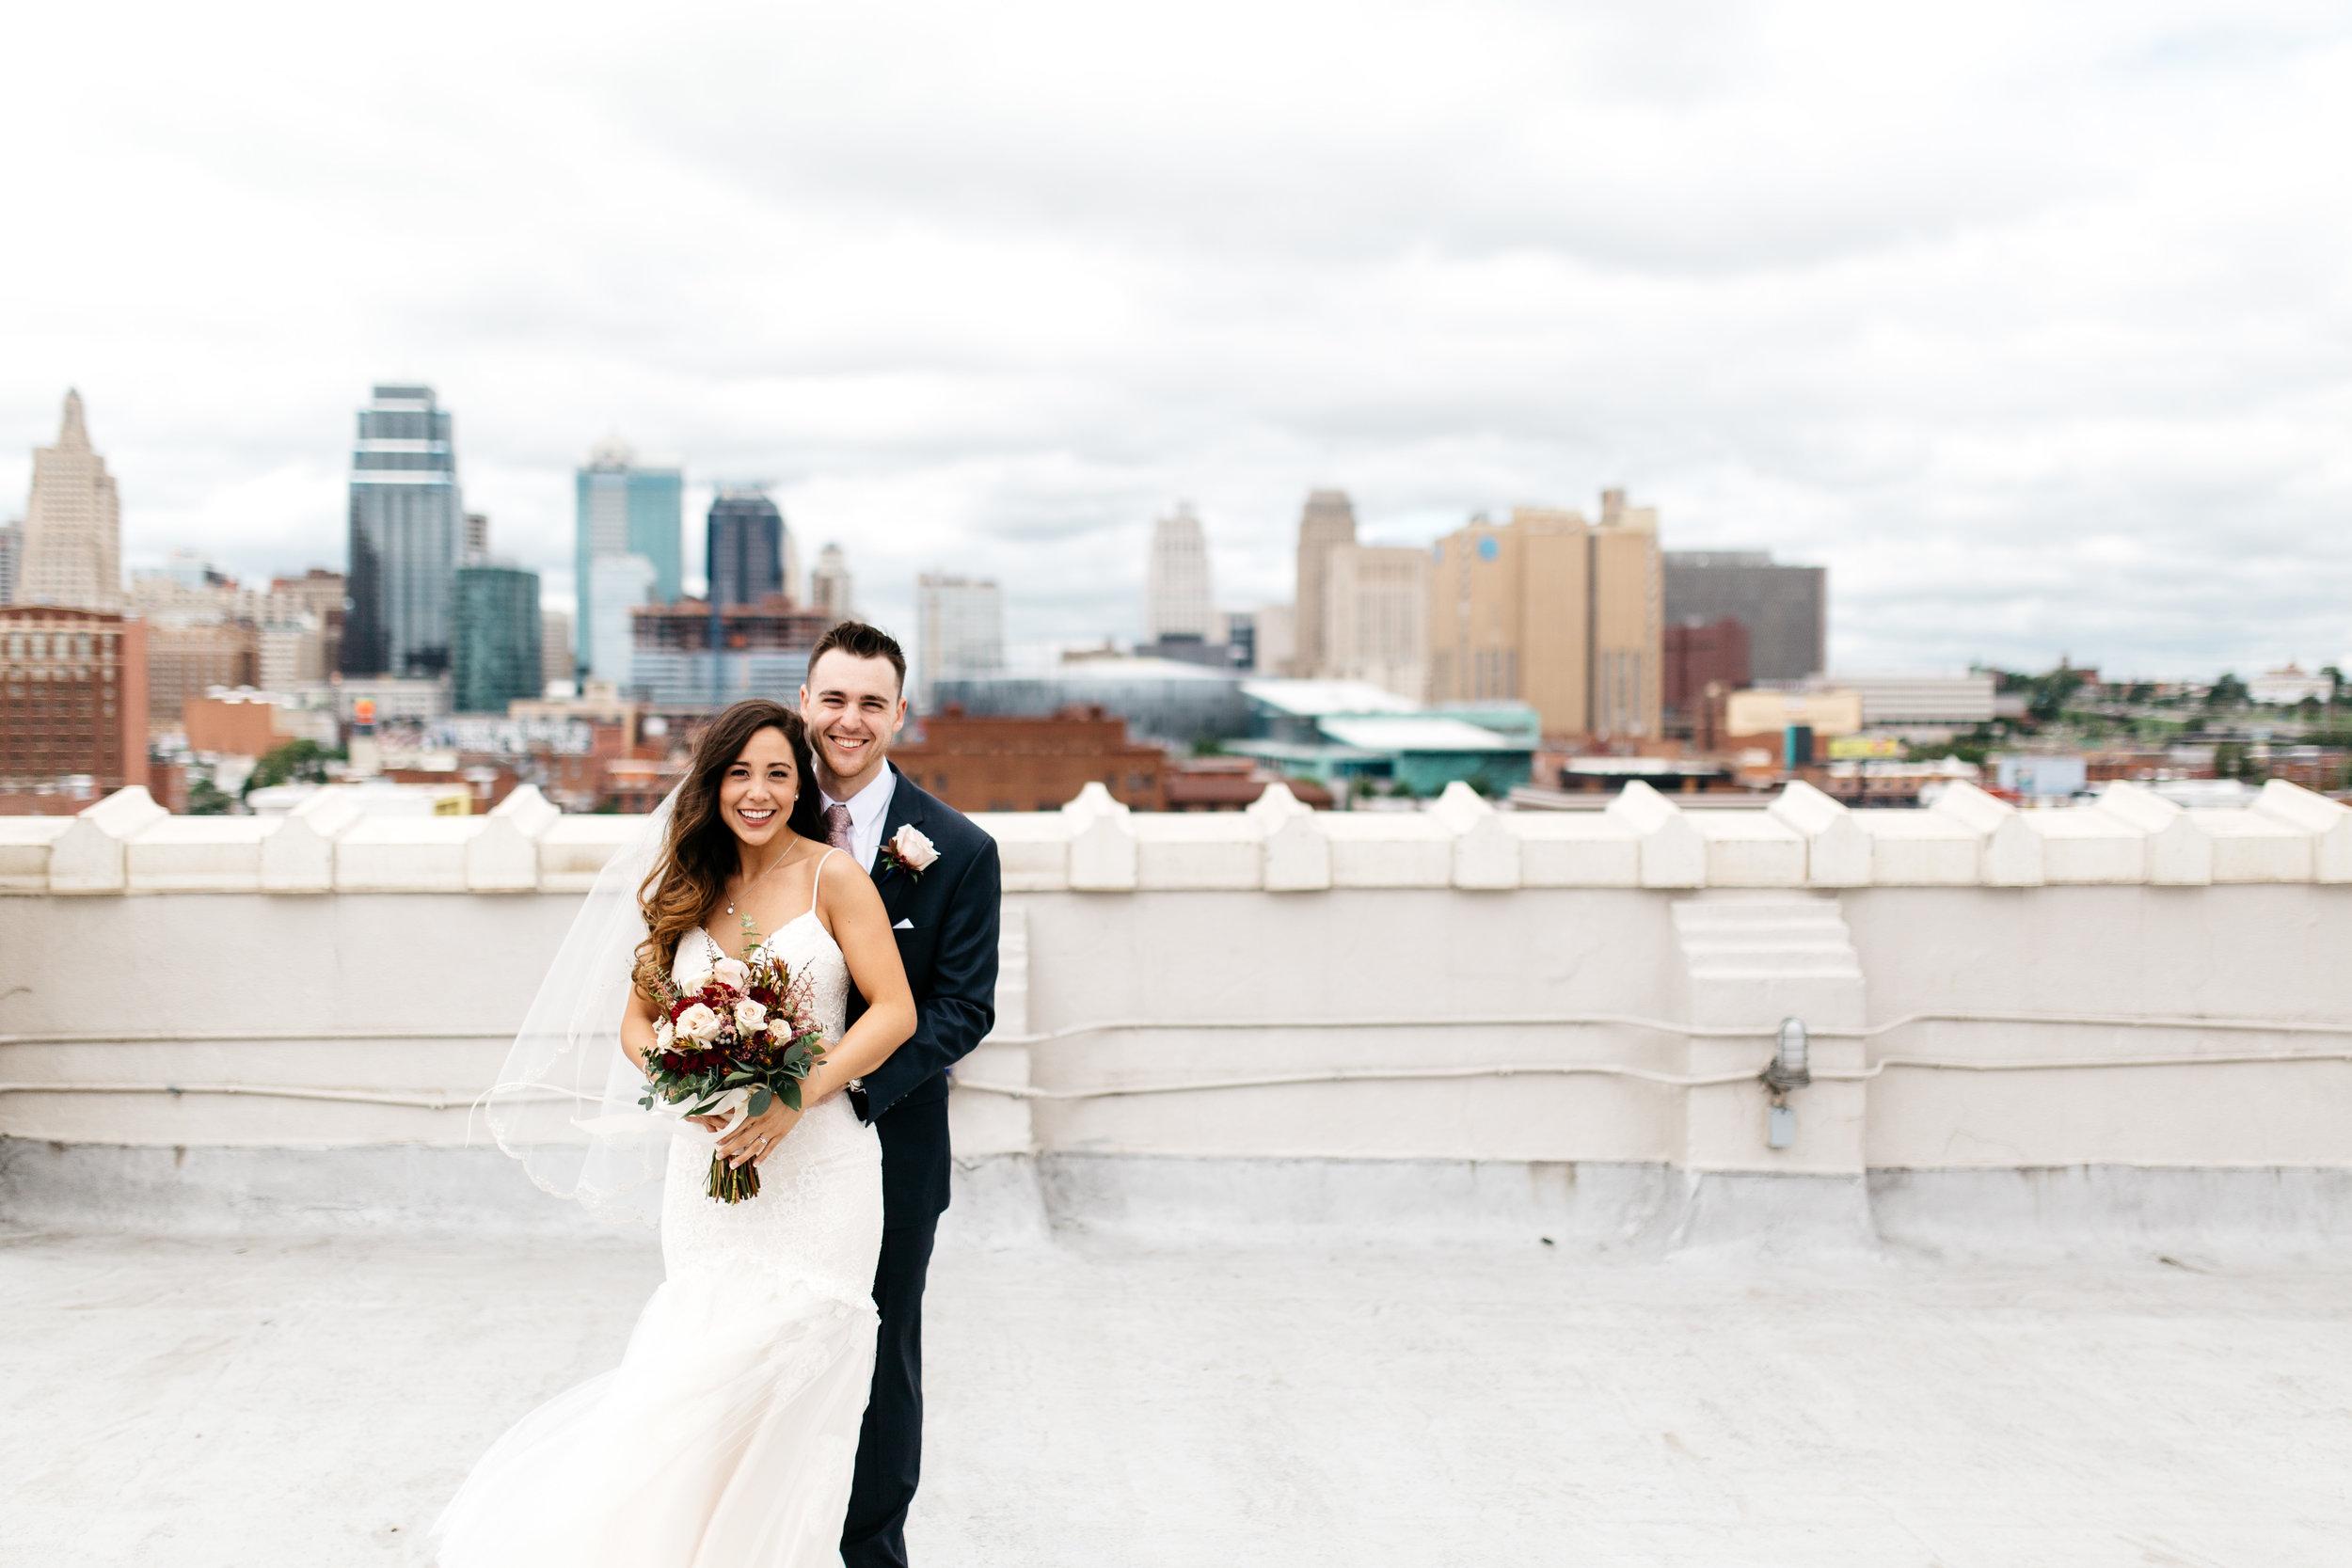 weddingblogmannring-68.jpg